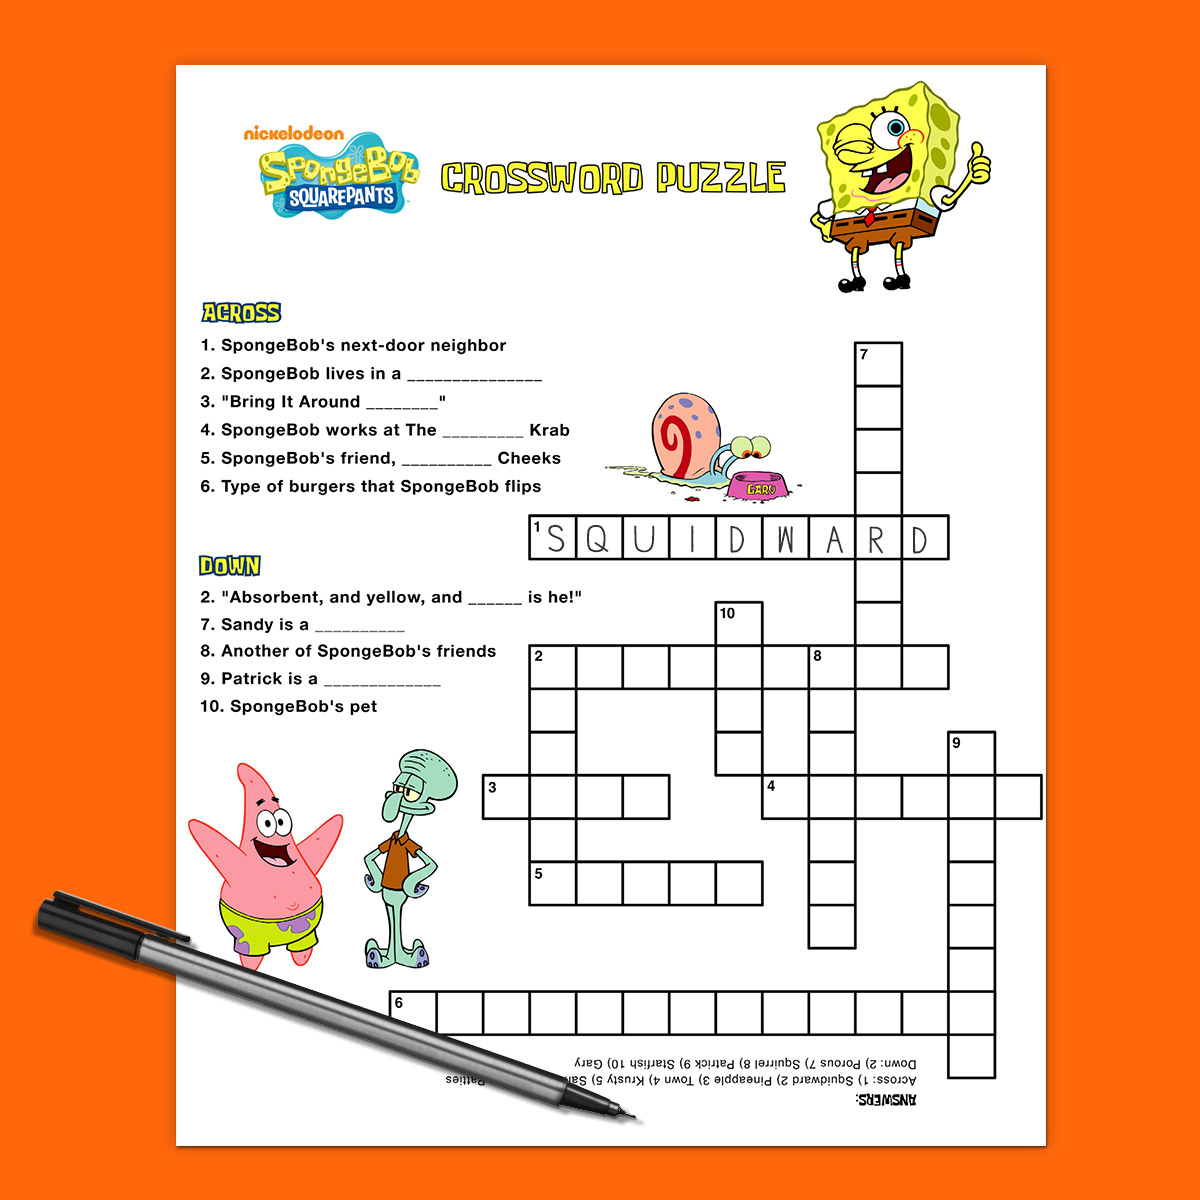 Spongebob Crossword Puzzle | Nickelodeon Parents - Teenage Crossword Puzzles Printable Free